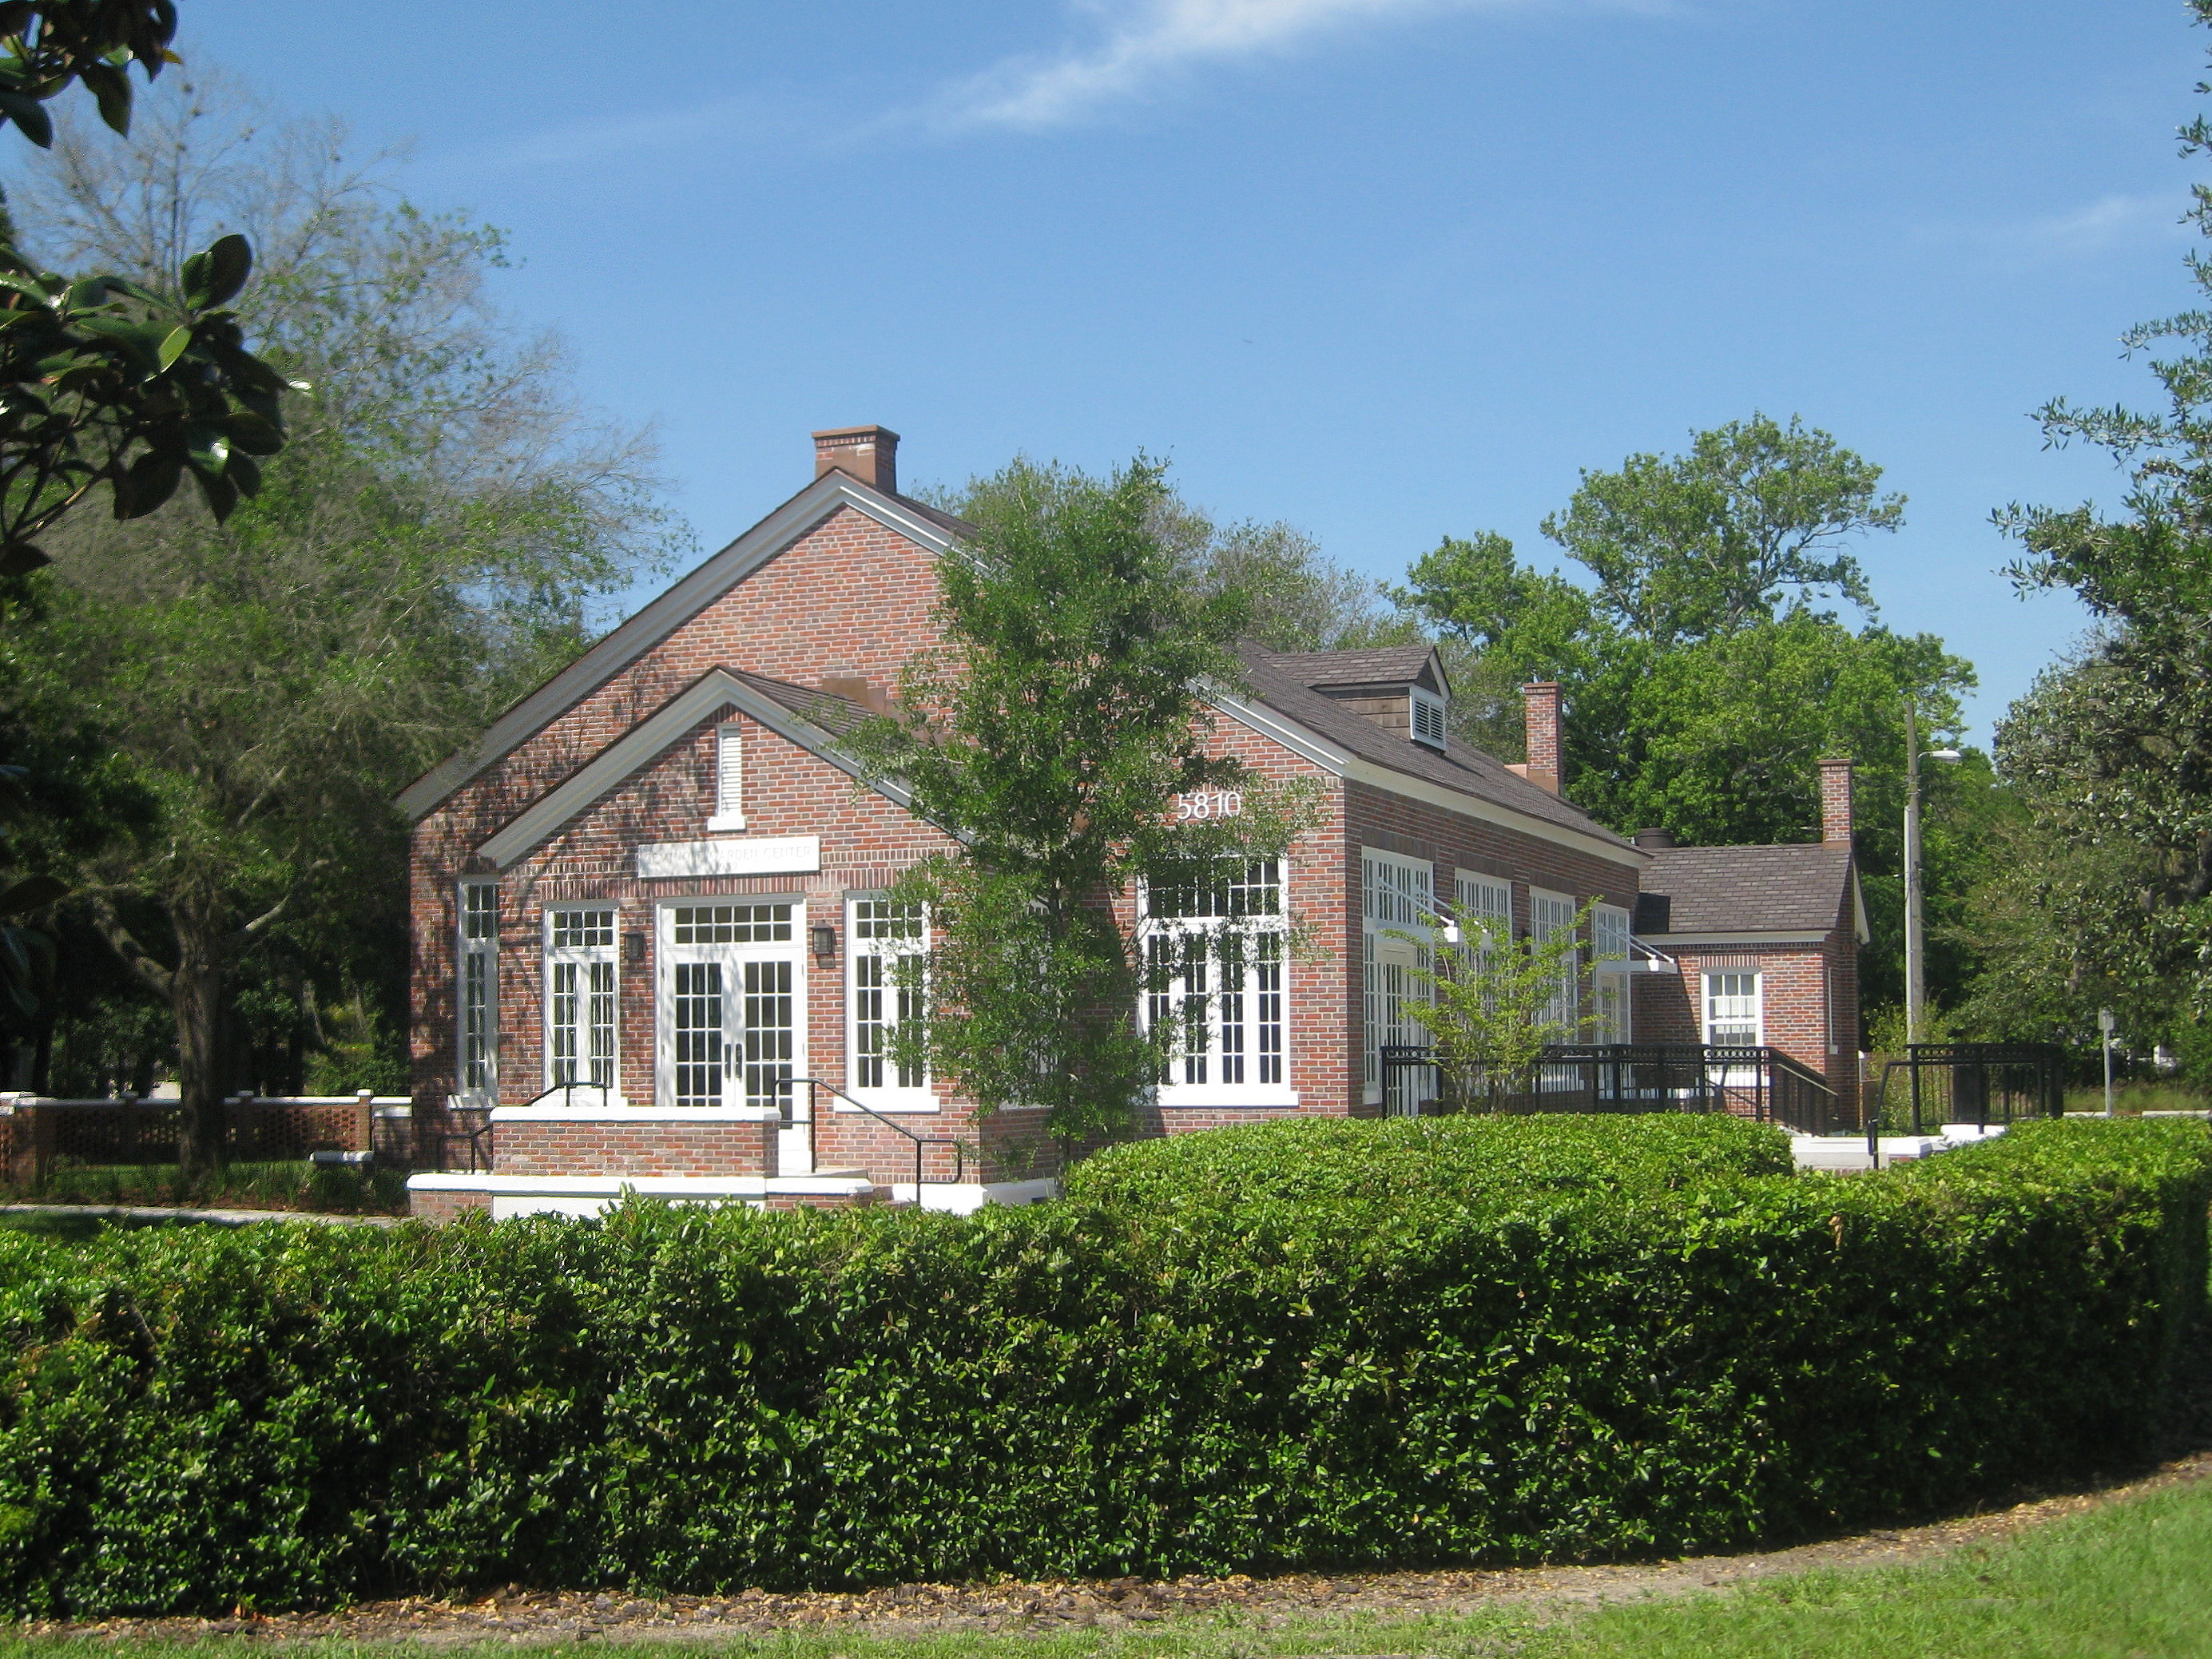 Exceptional Waynesboro Landscape And Garden Center Like Inspiration Article